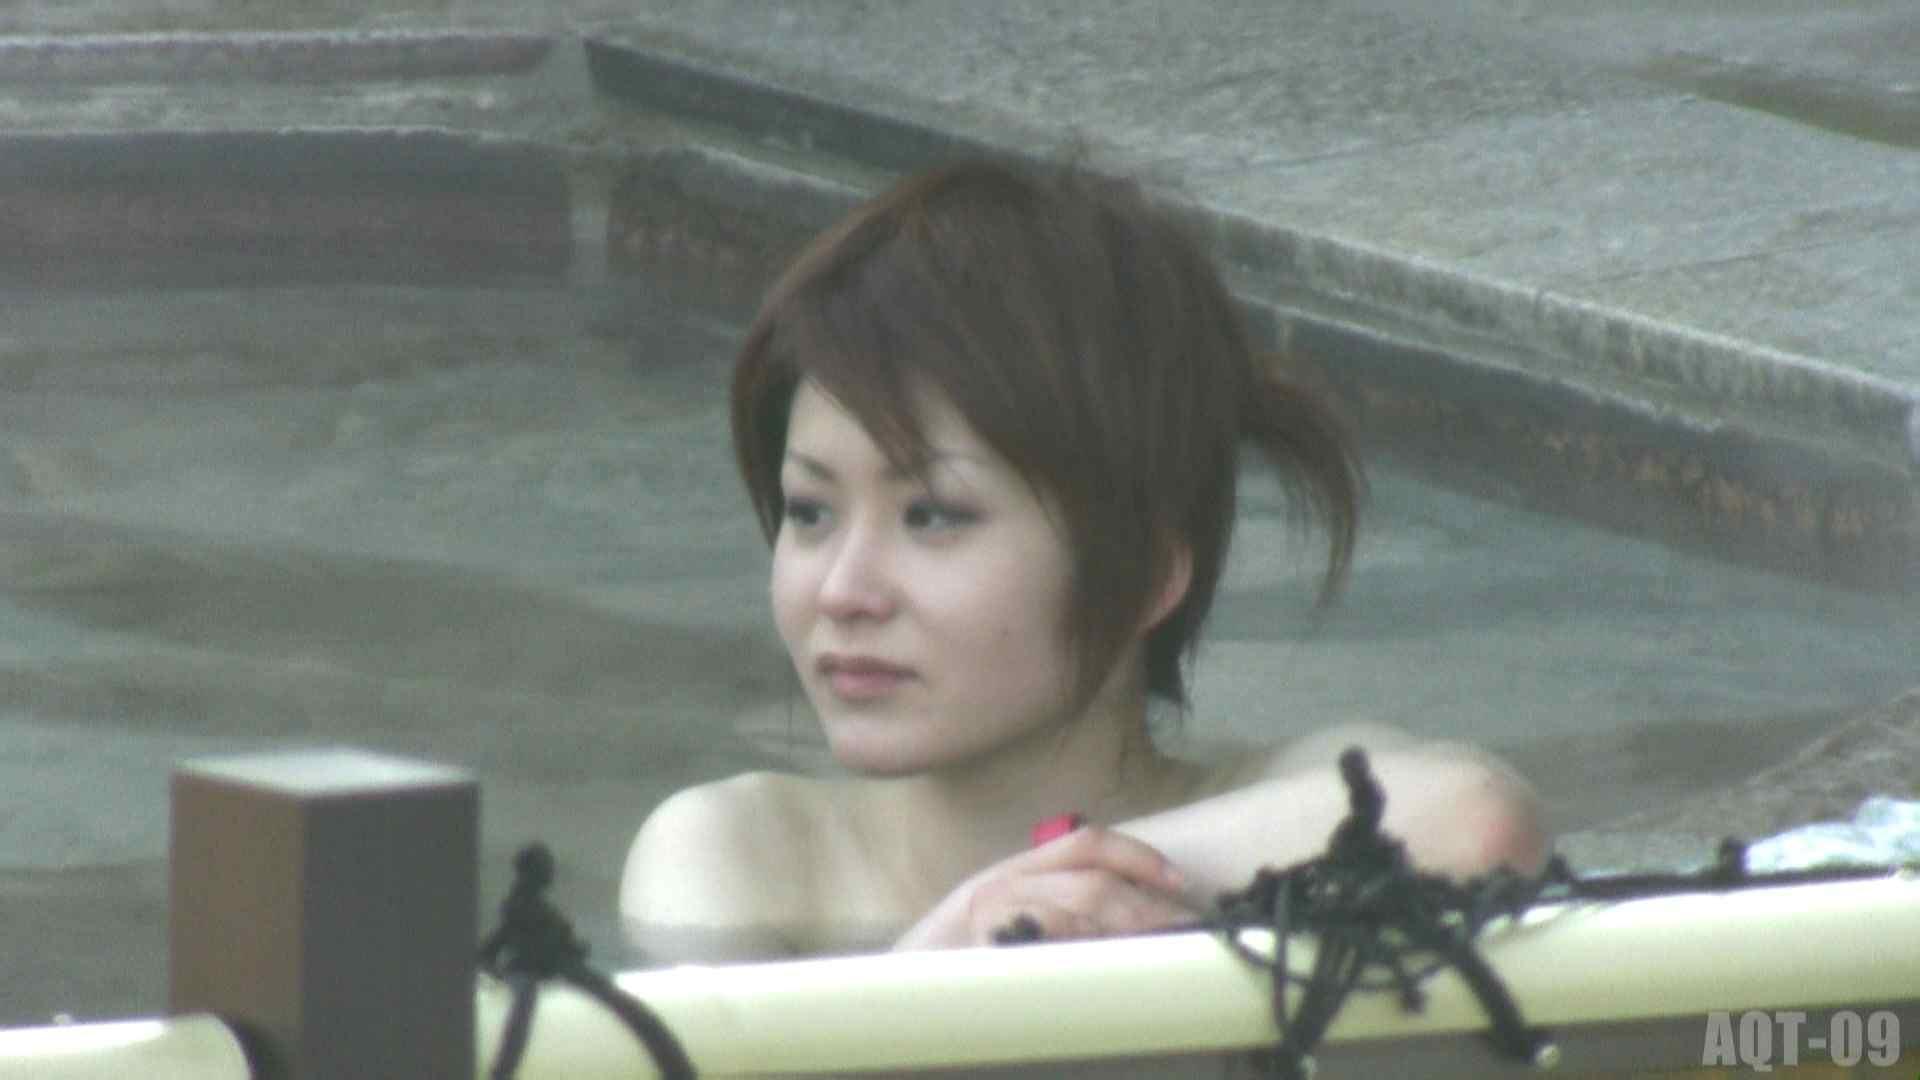 Aquaな露天風呂Vol.779 露天風呂 | OLのエロ生活  81連発 37